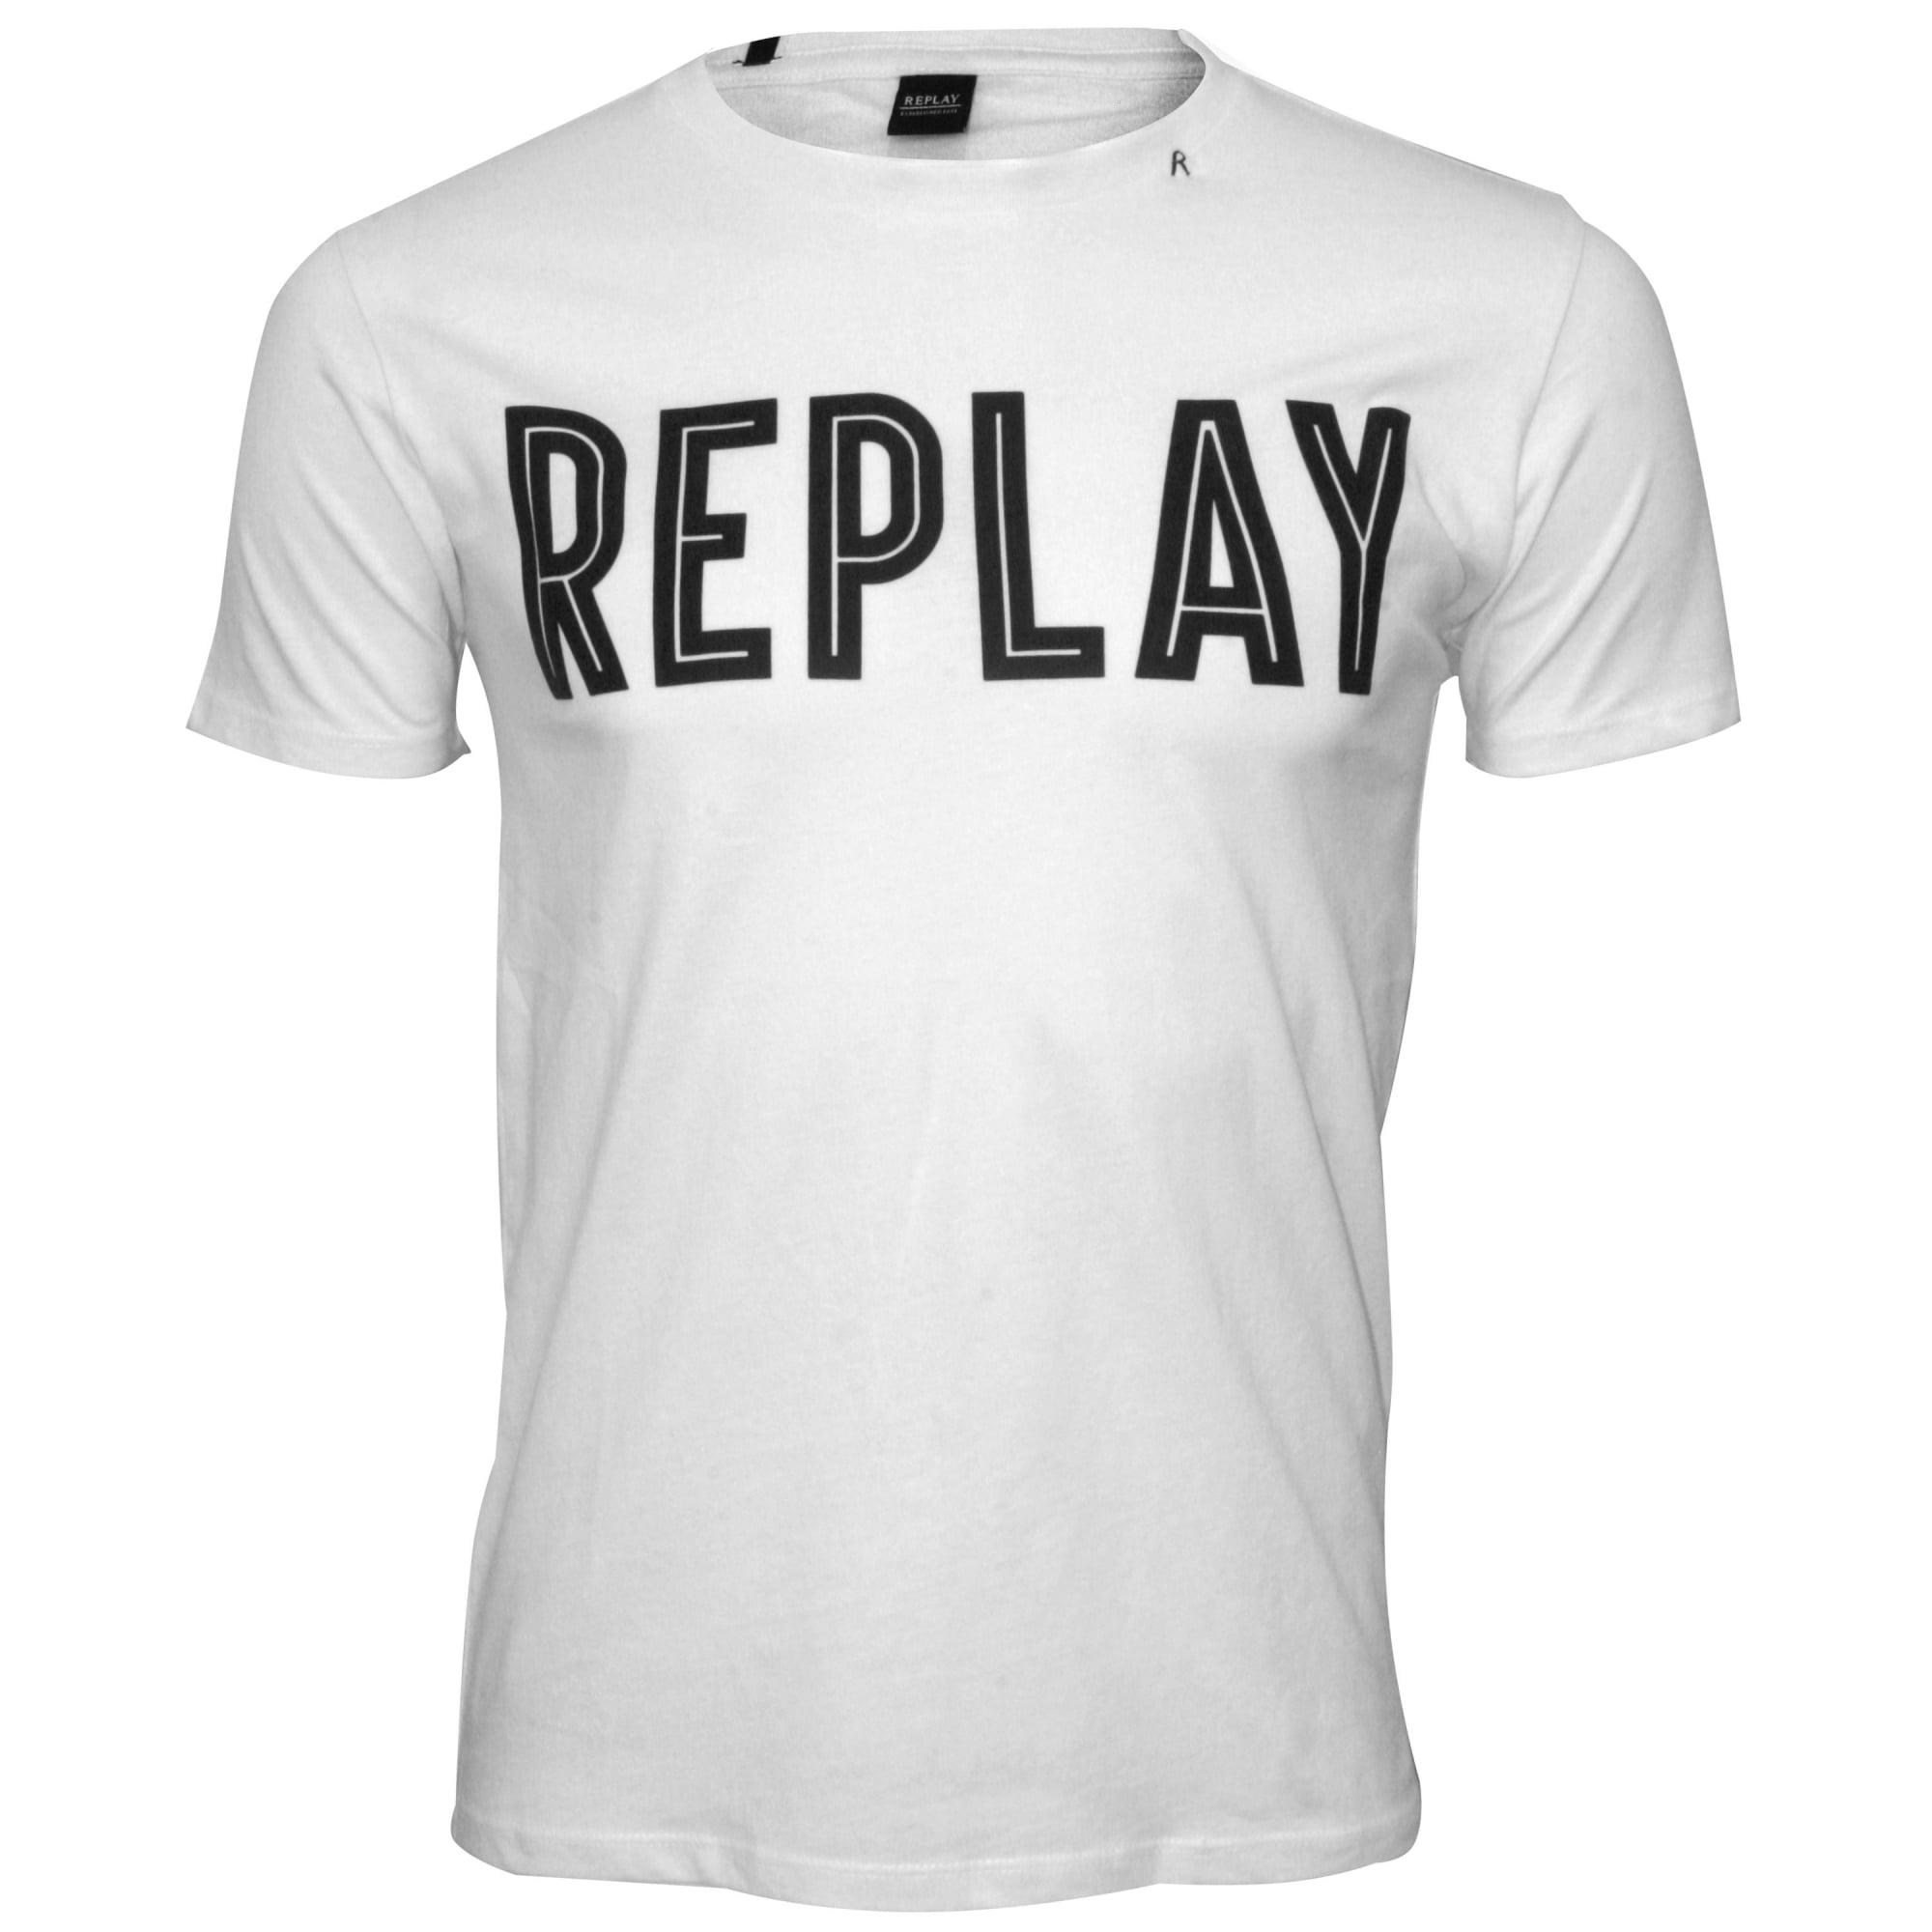 REPLAY brand new t-shirt  sz.L